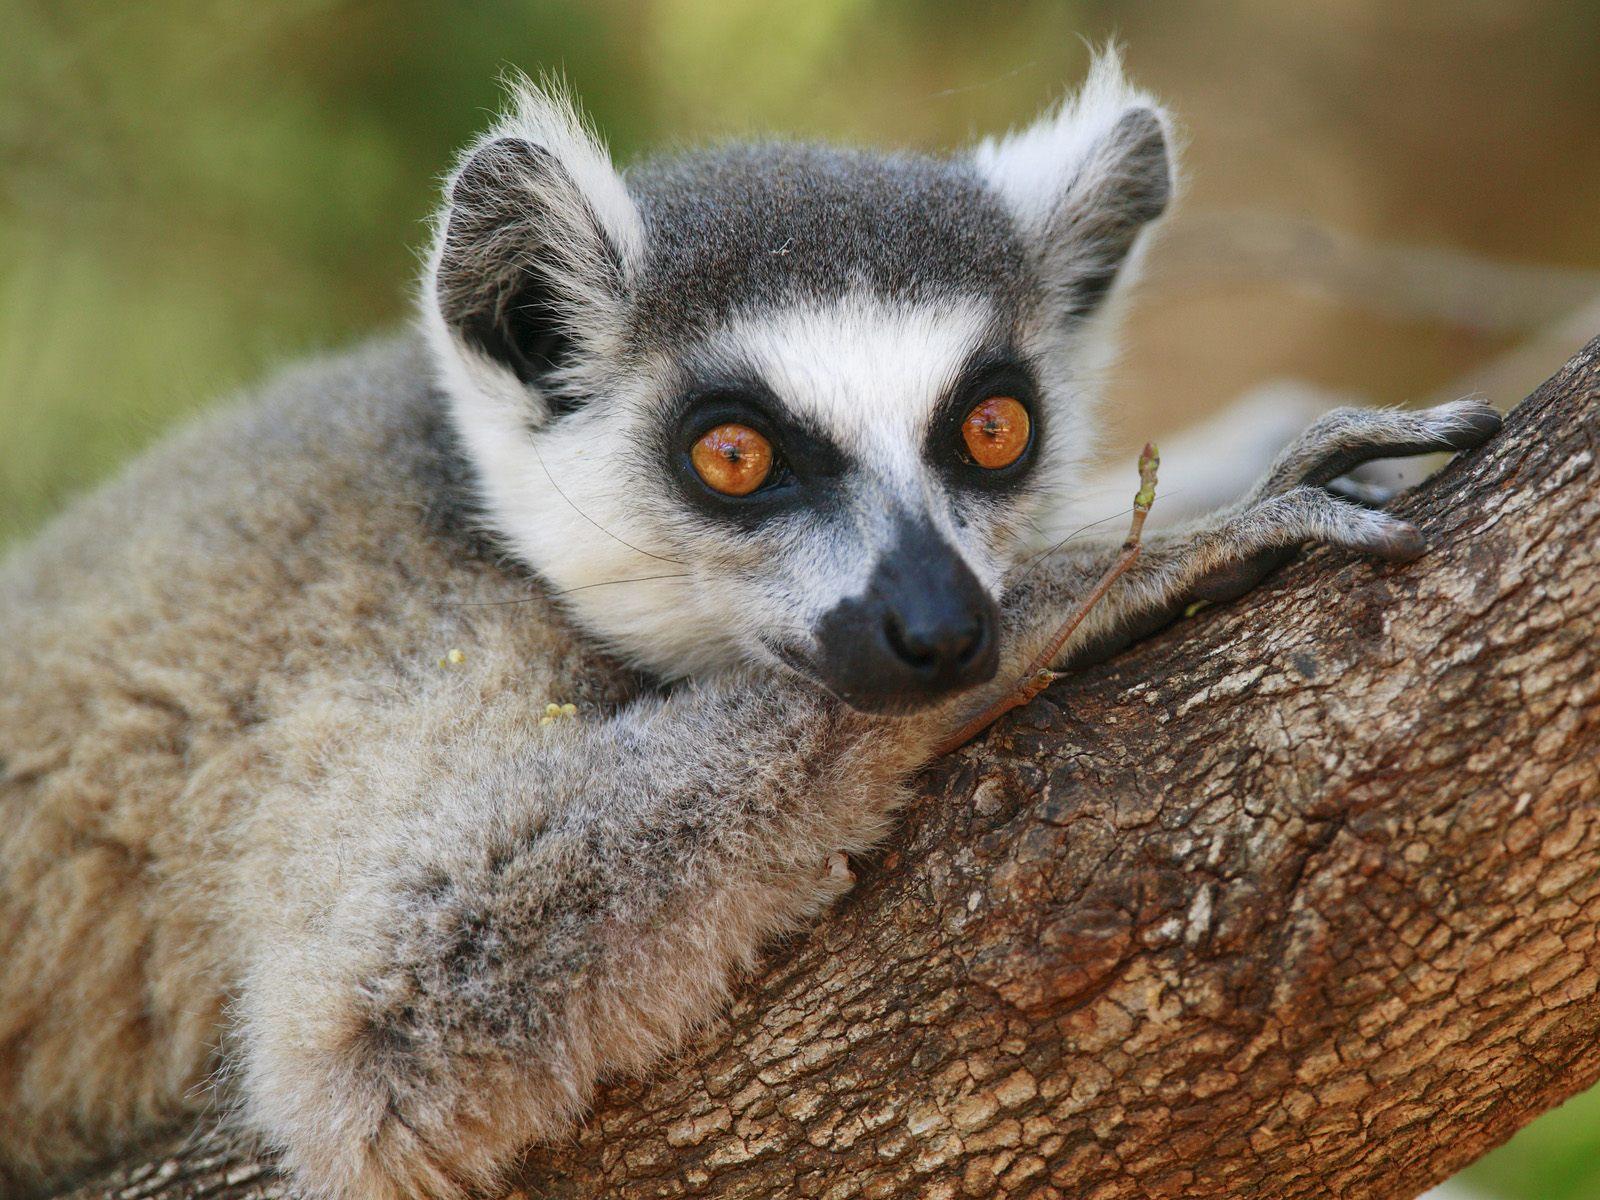 Animals In Their Natural Habitat Ii